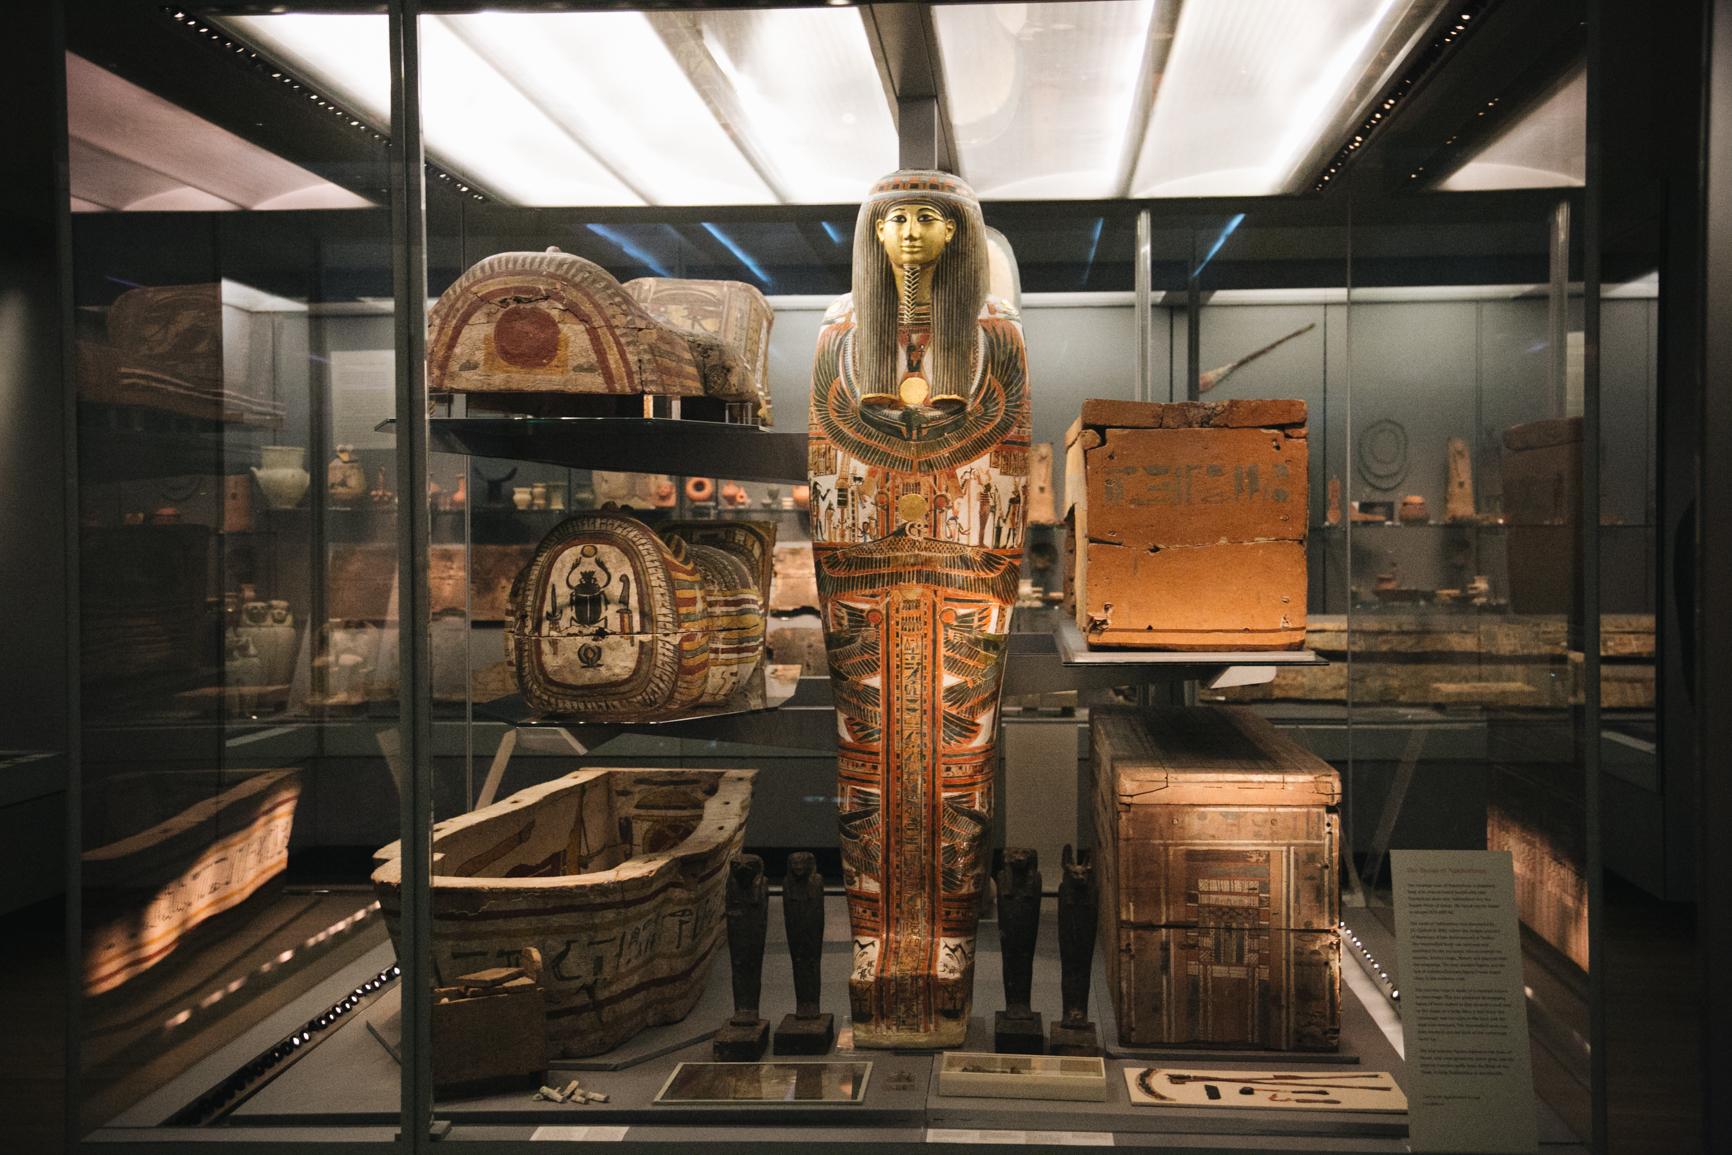 fitzwilliam-musee-cambridge-a-voir.jpg